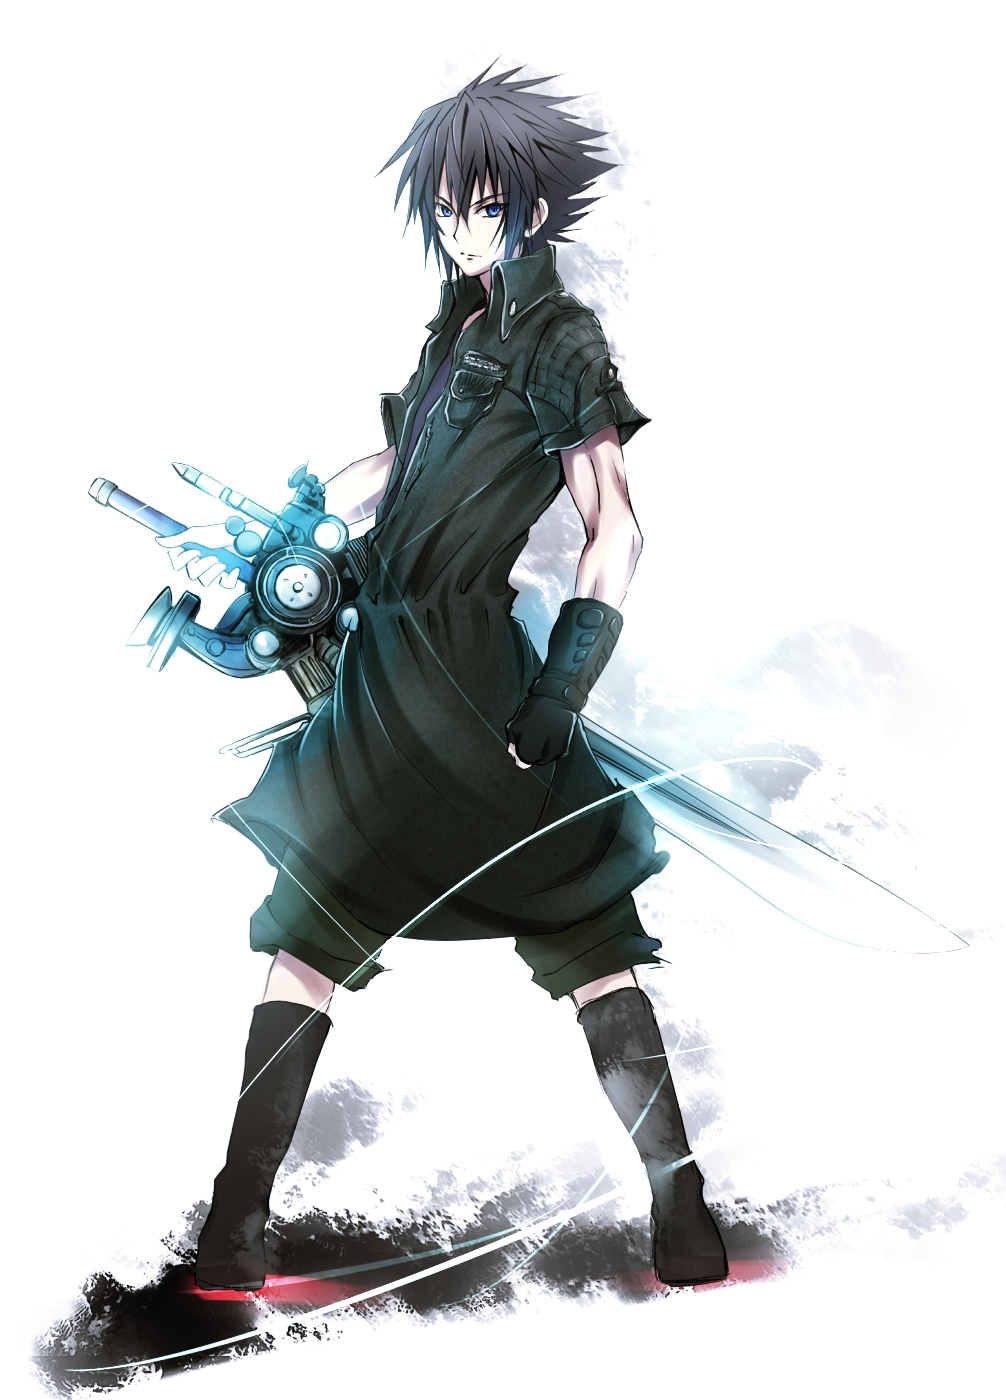 Final Fantasy 7 Anime Characters : Noctis lucis caelum zerochan